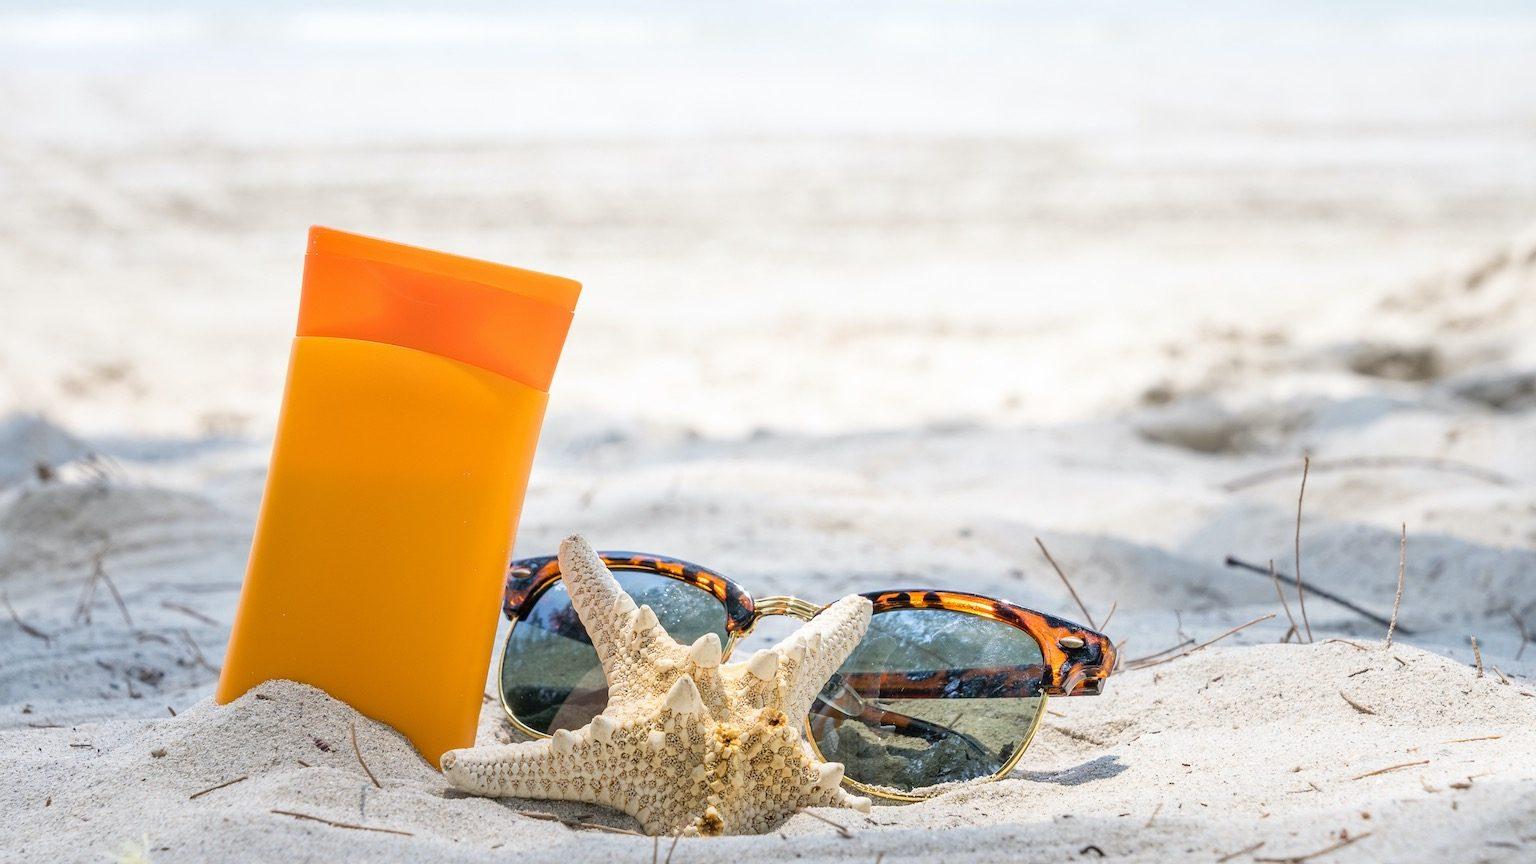 beach, sunscreen, summer, lotion, protection, cream, sun, vacation, care, skin, sunblock, tan, suntan, body, holiday, sea, female, sunbathing, skincare, woman, girl, applying, young, health, travel, beauty, people, beautiful, sand, suncream, moisturiz